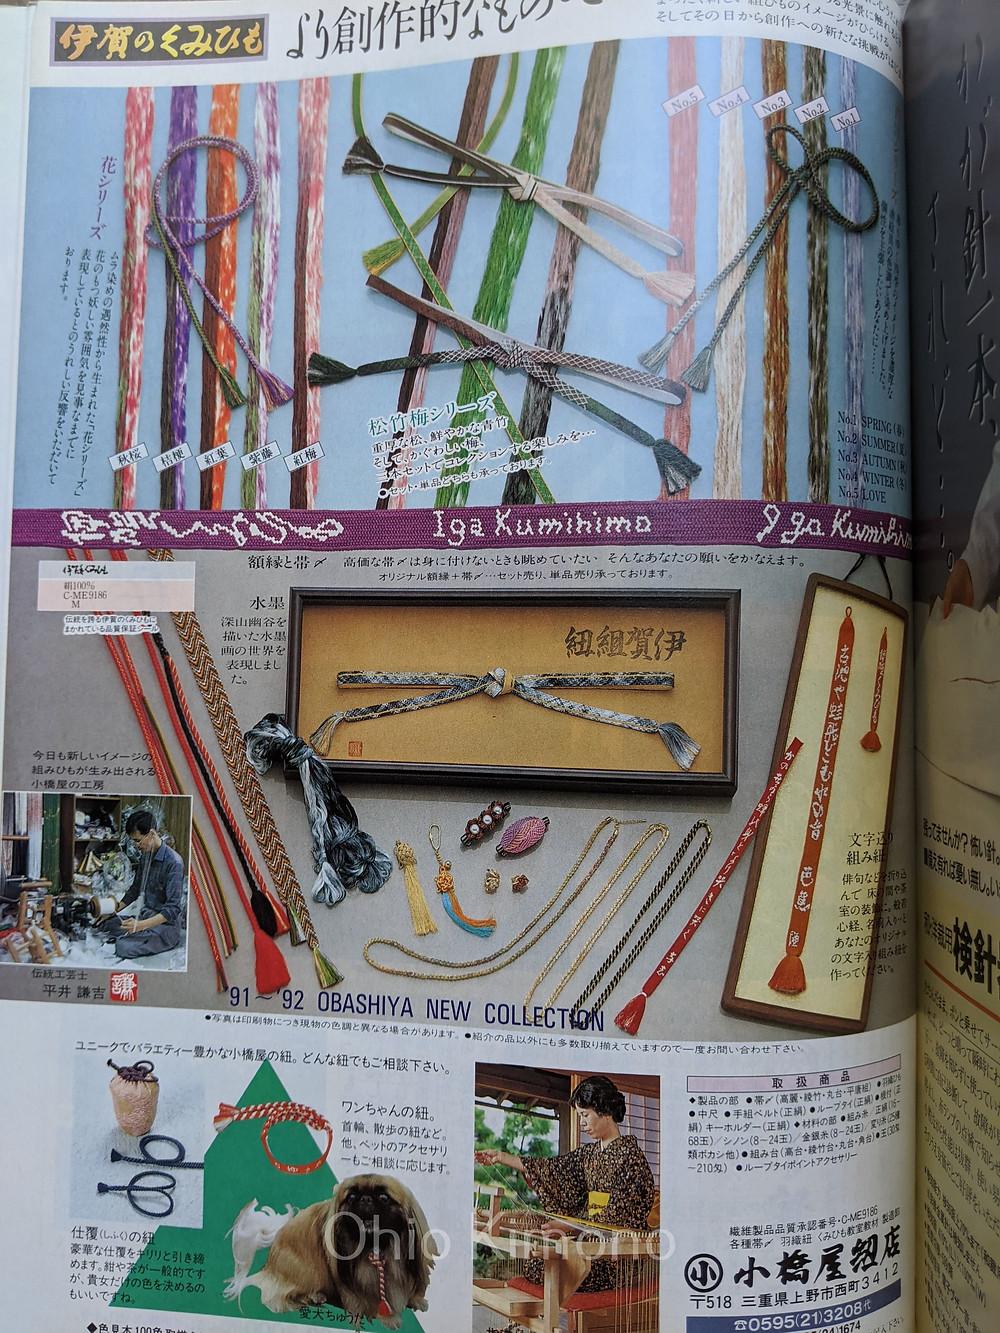 1990s japanese kimono style magazine